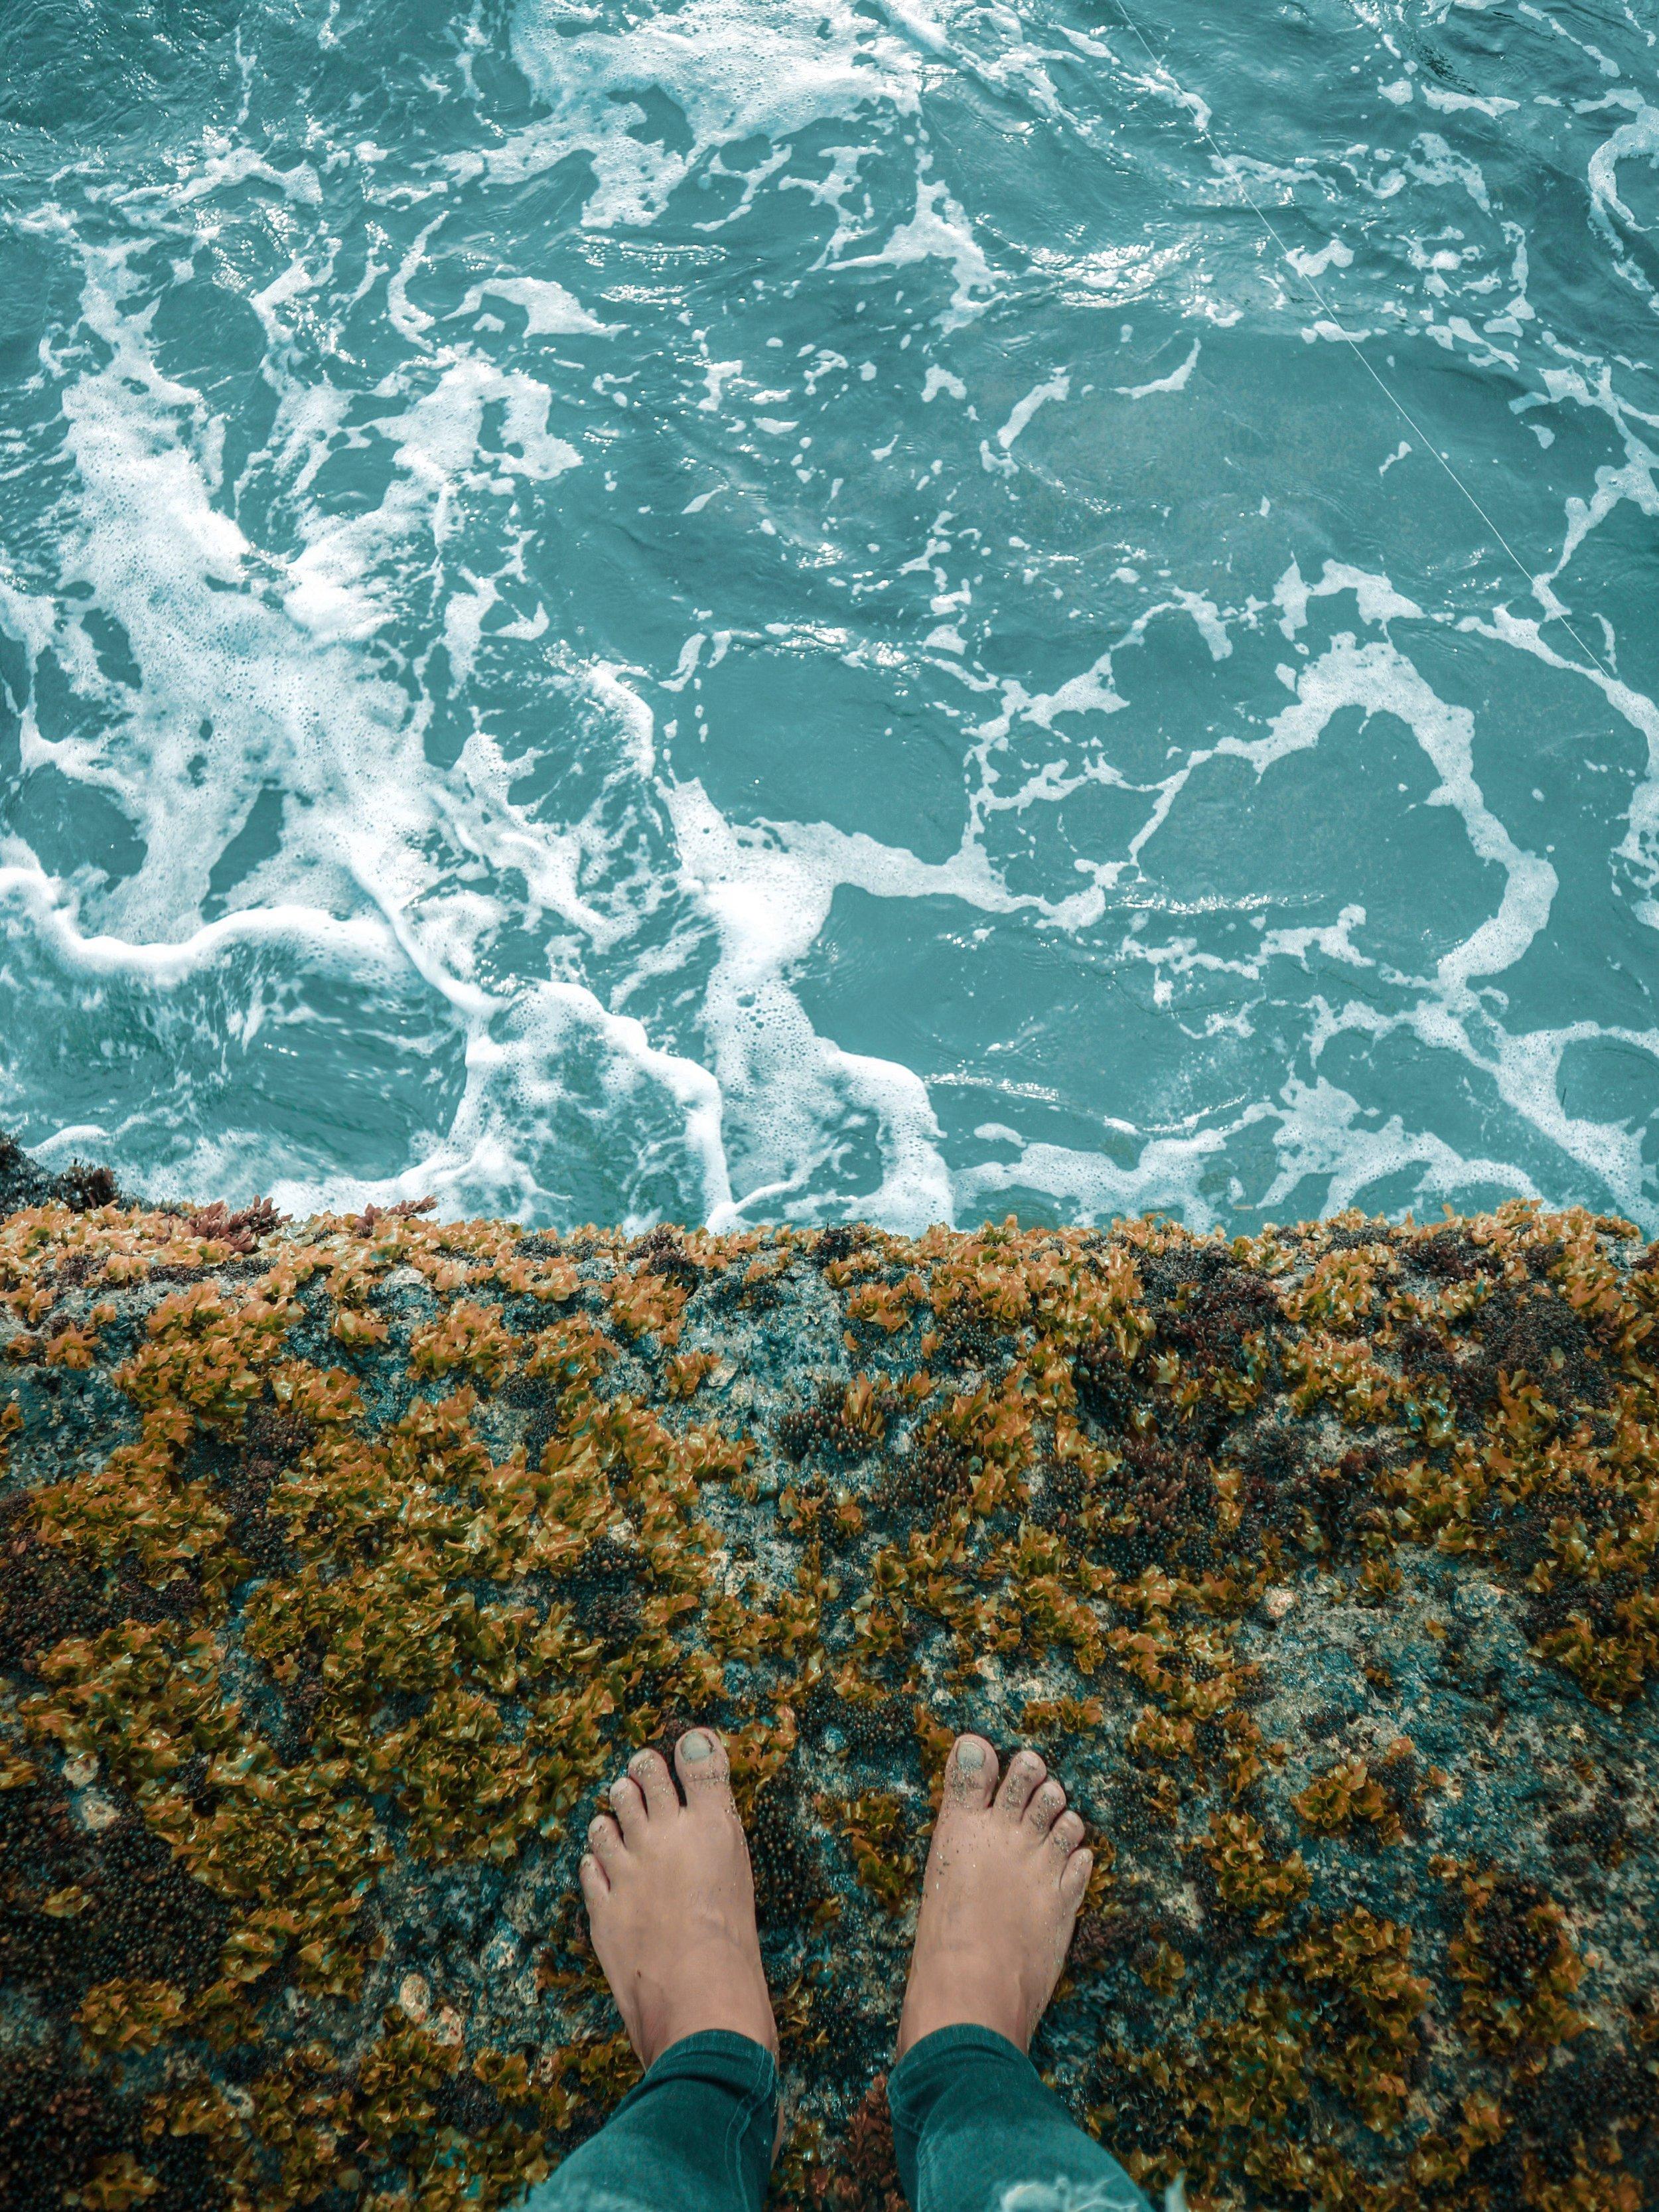 Daylight Feet. By RJ Prabualone. Pexel.com.